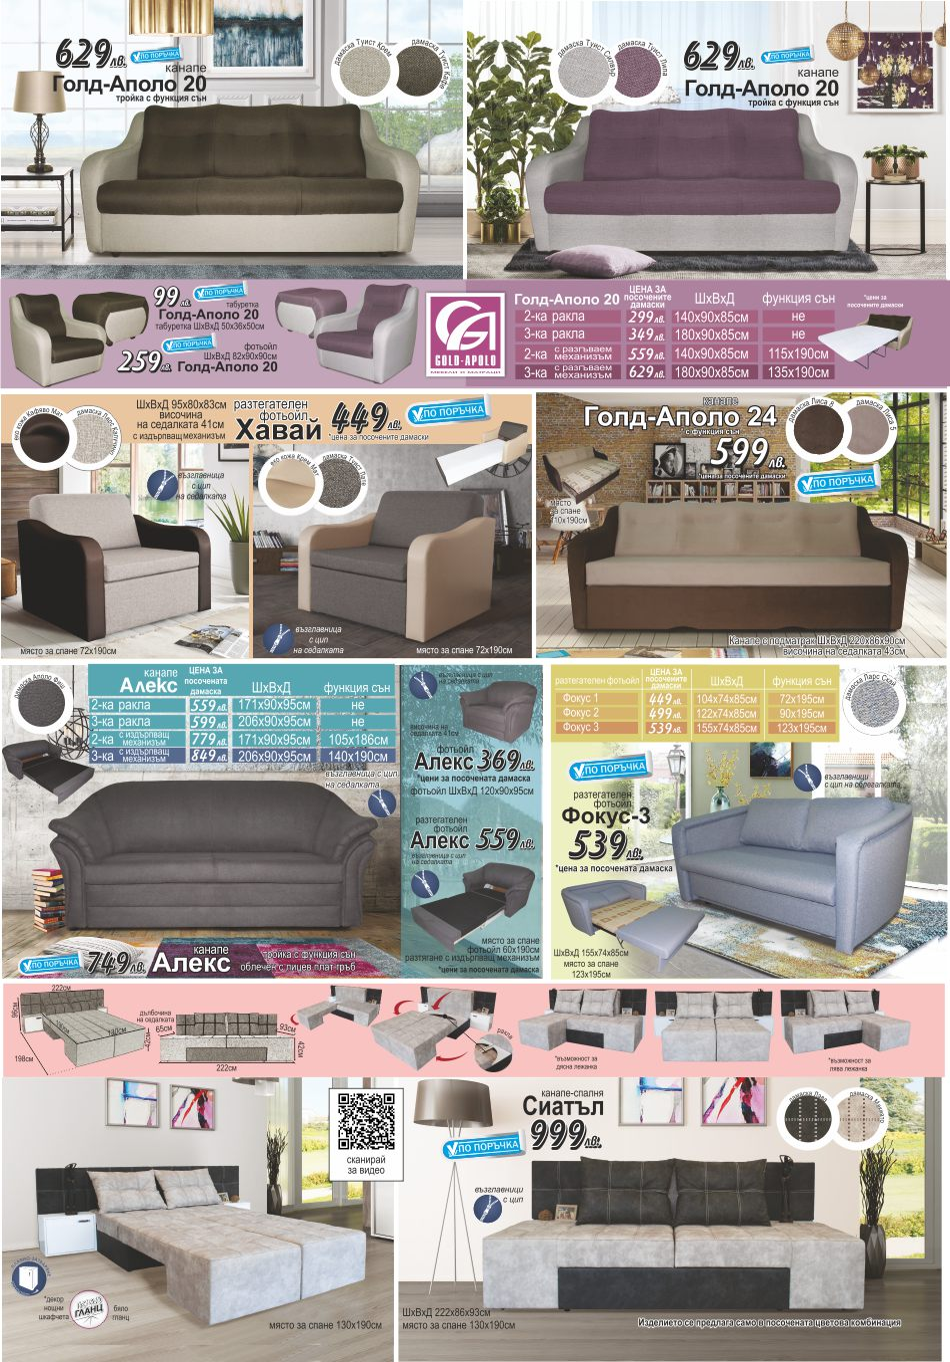 b_sofas_p3.jpg